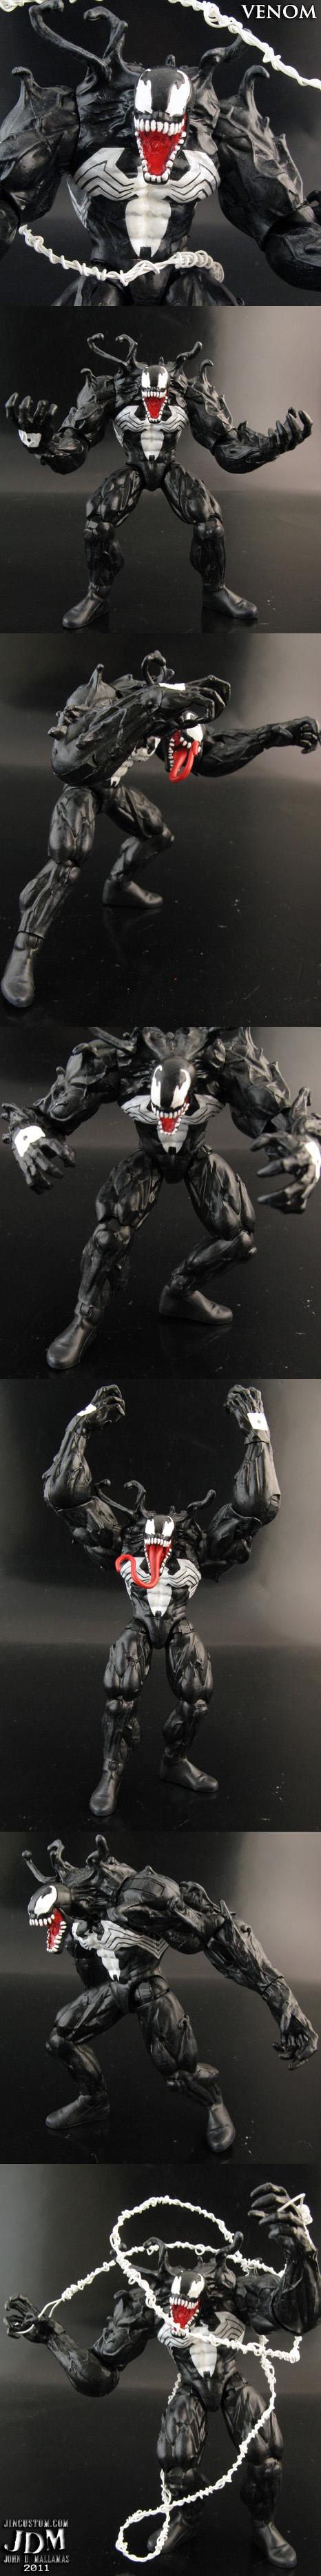 Marvel Universe Venom